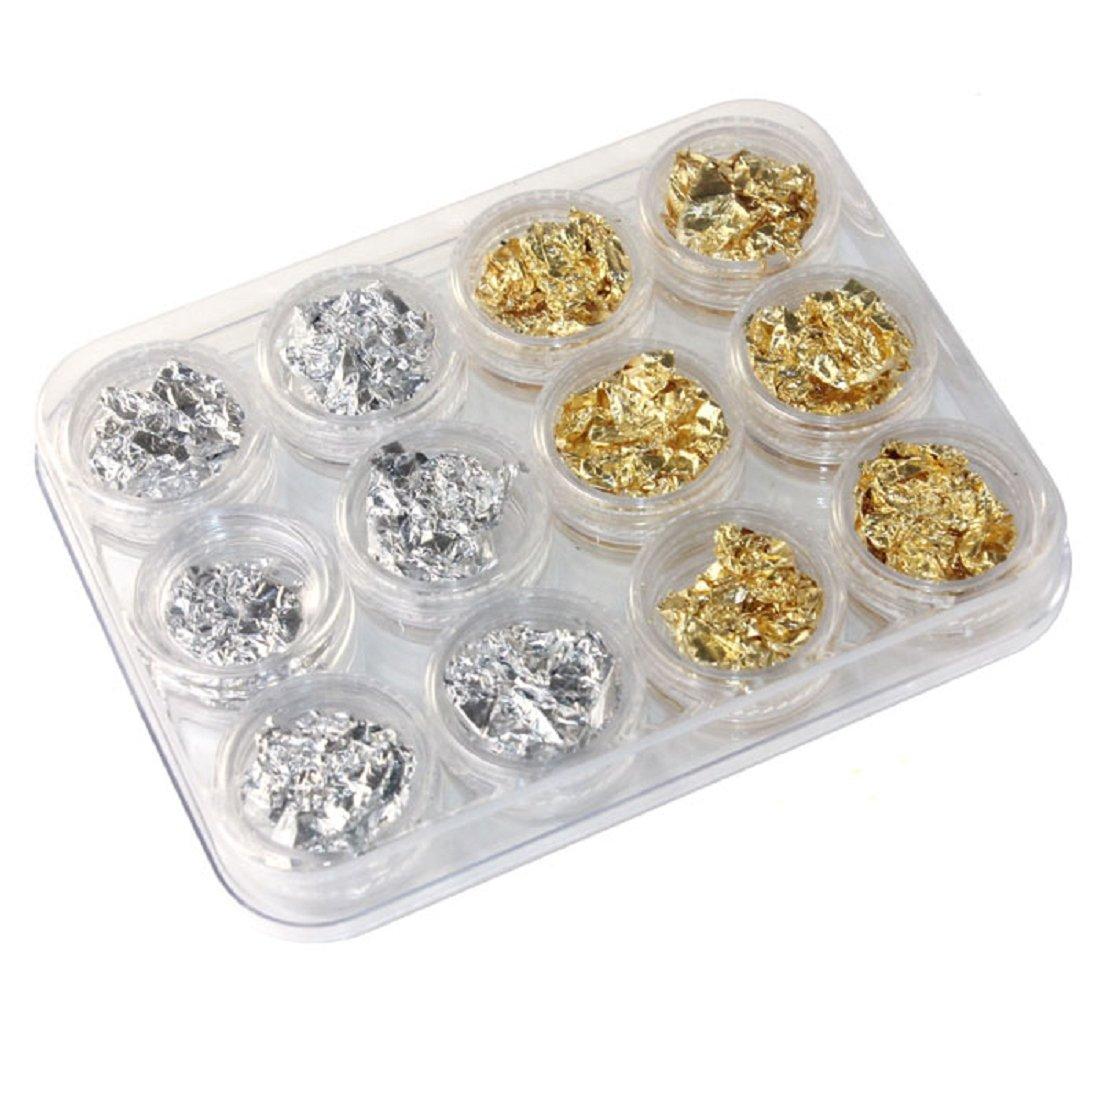 Sannysis 12 PCS Nail Art Gold Silver Paillette Flake Chip Foil DIY Acrylic UV Gel Pager